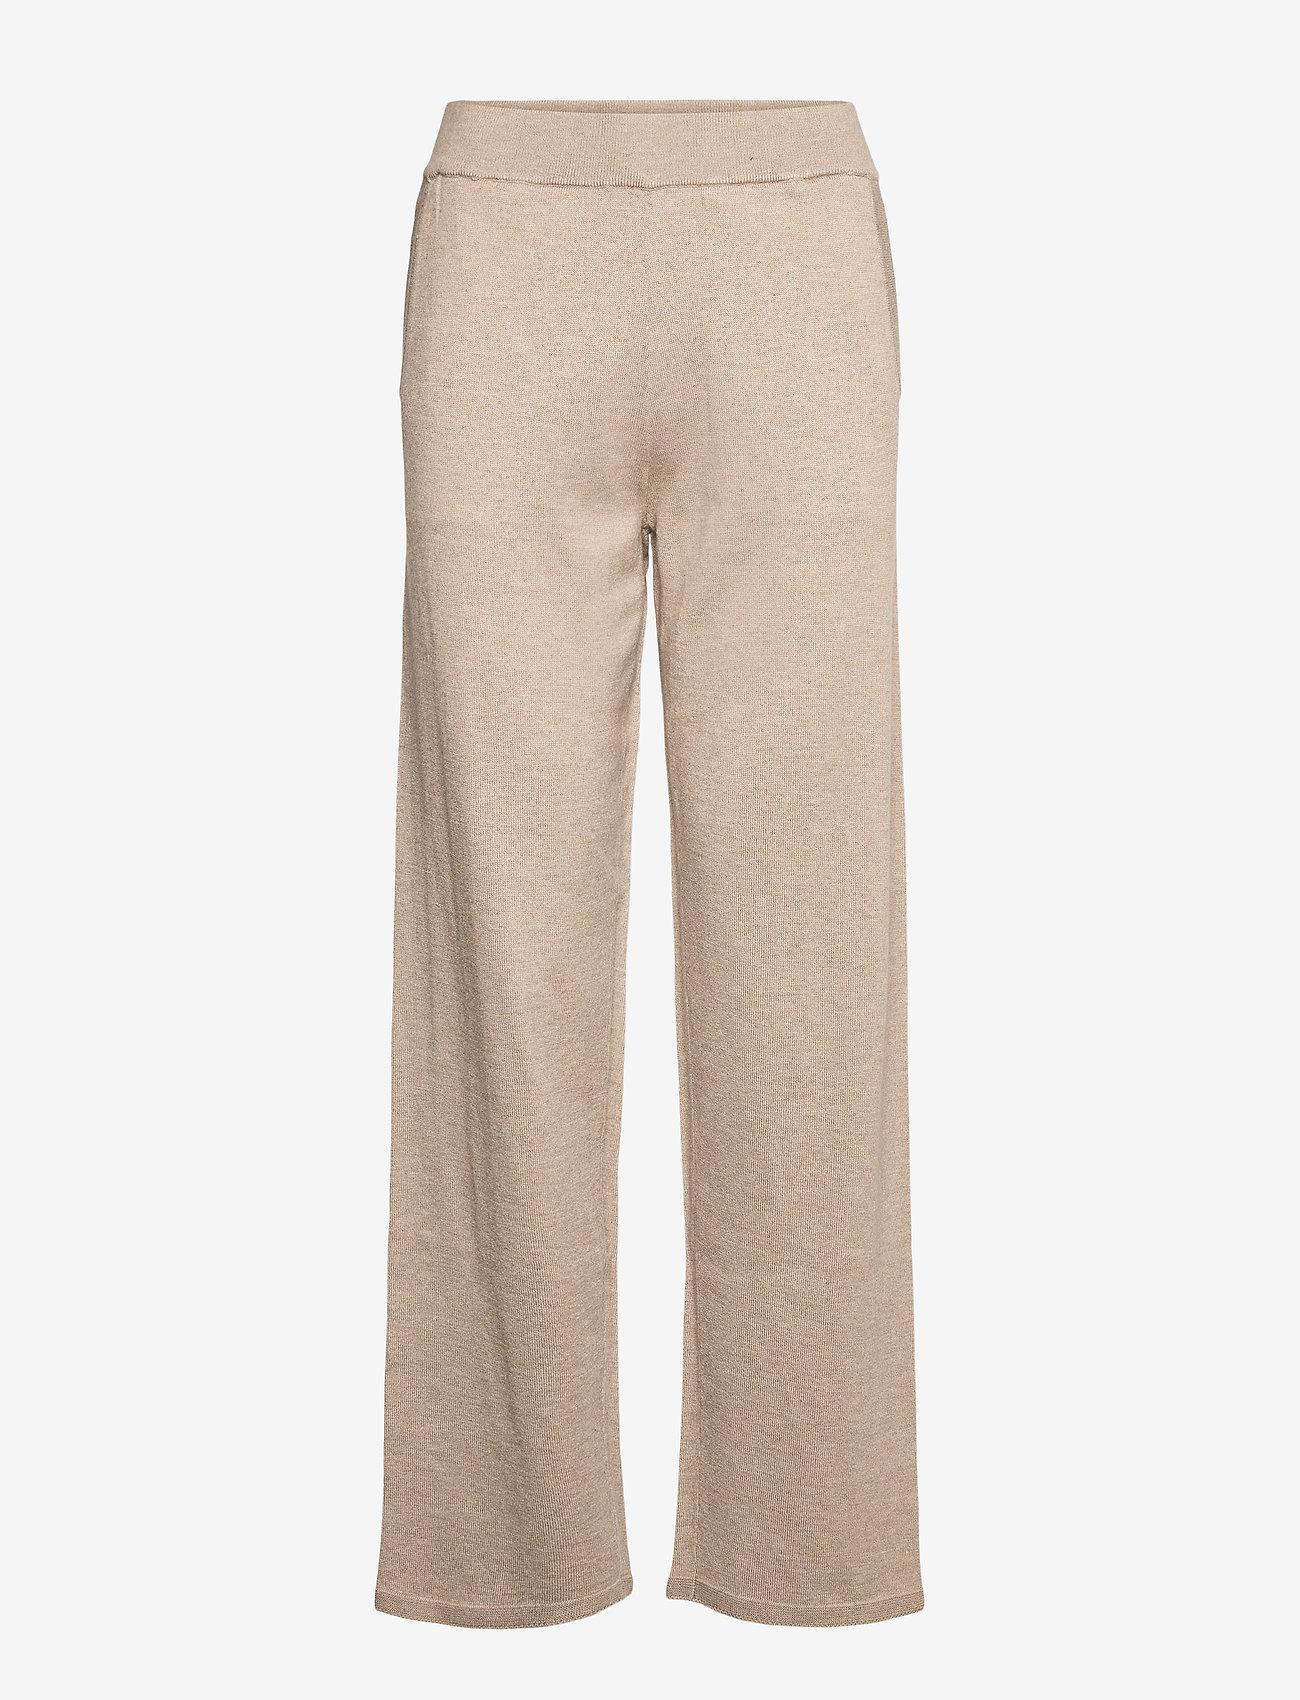 Selected Femme - SLFINKA MW LONG KNIT PANT - sweatpants - sand - 0